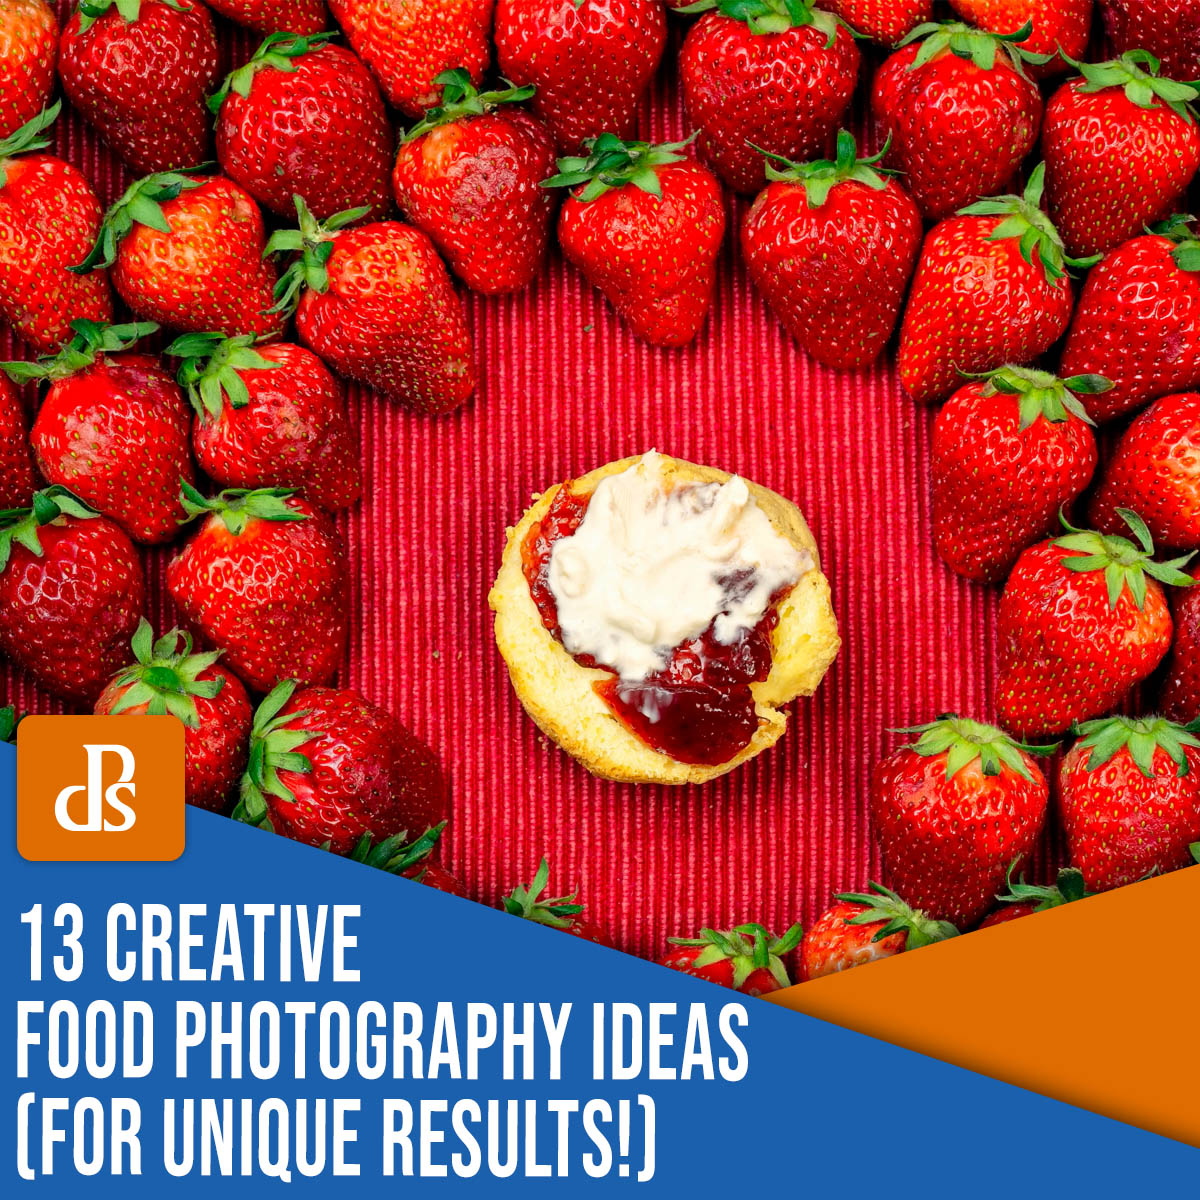 13 creative food photography ideas